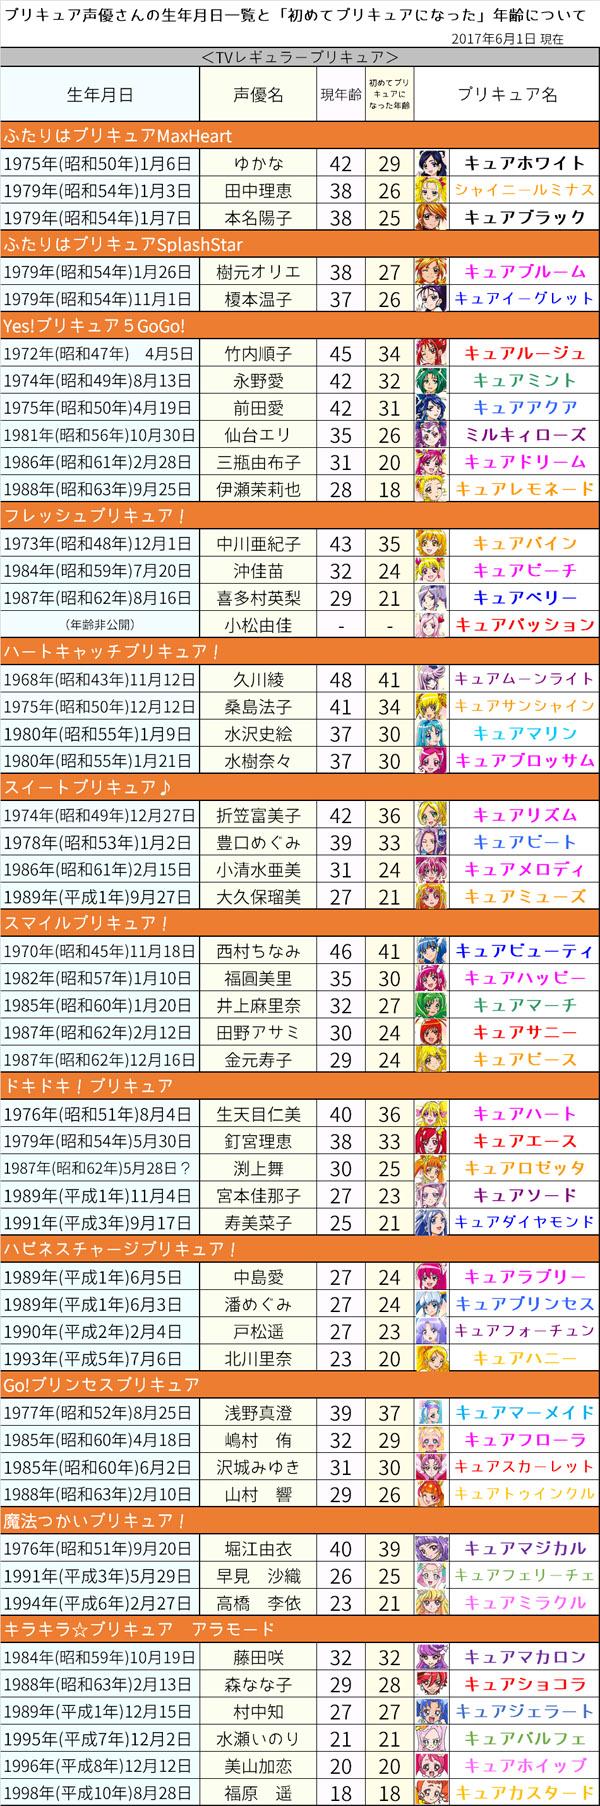 https://cdn-ak2.f.st-hatena.com/images/fotolife/k/kasumi19732004/20170601/20170601211640_original.jpg